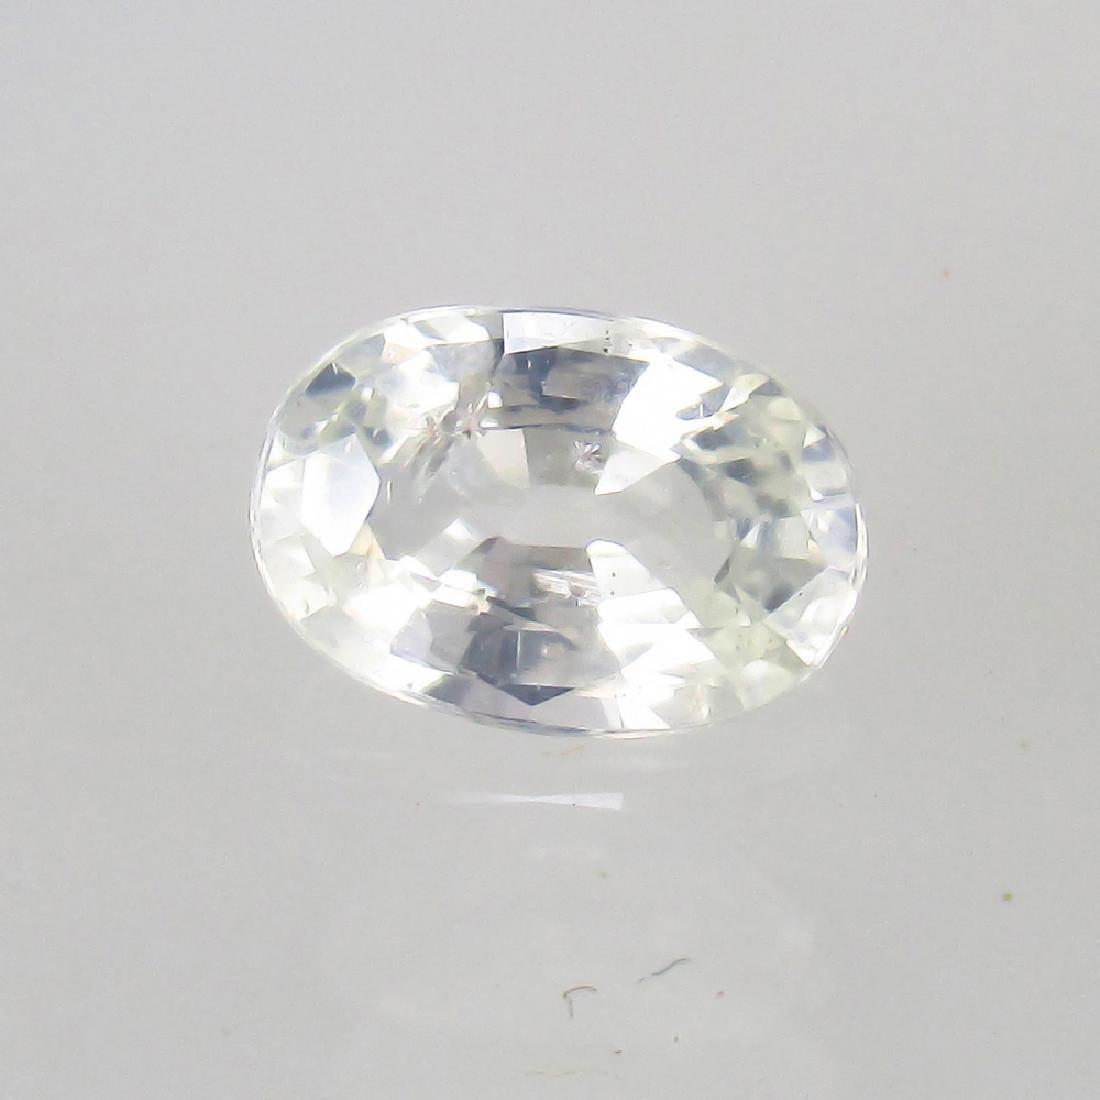 0.68 Ct Genuine Ceylon White Sapphire Nice Oval Cut